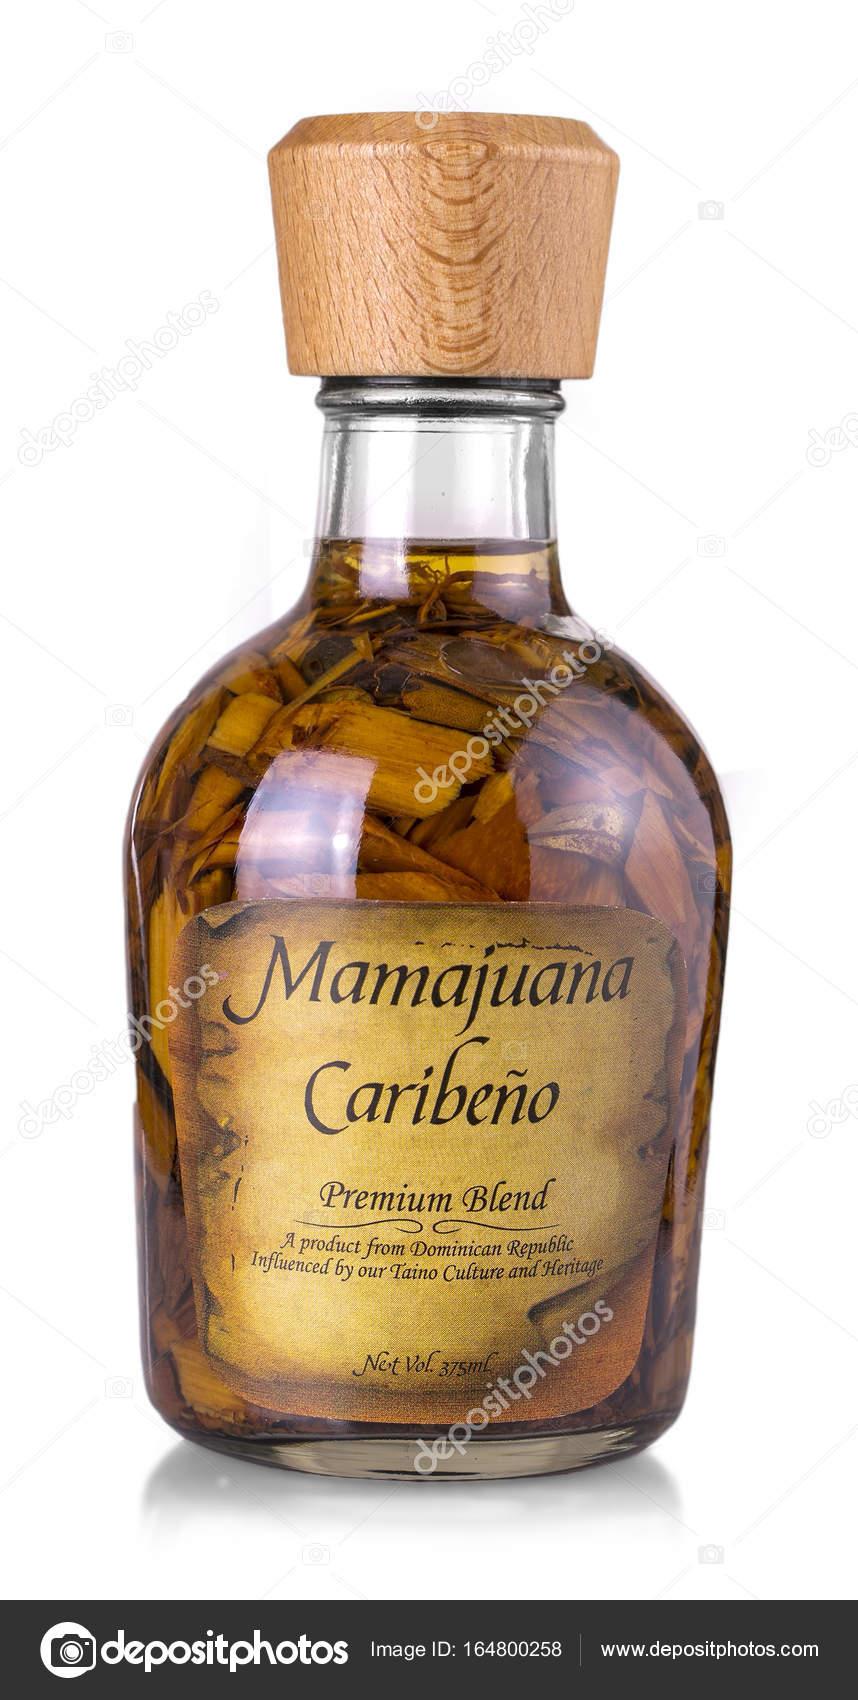 mamajuana afrodisiakum